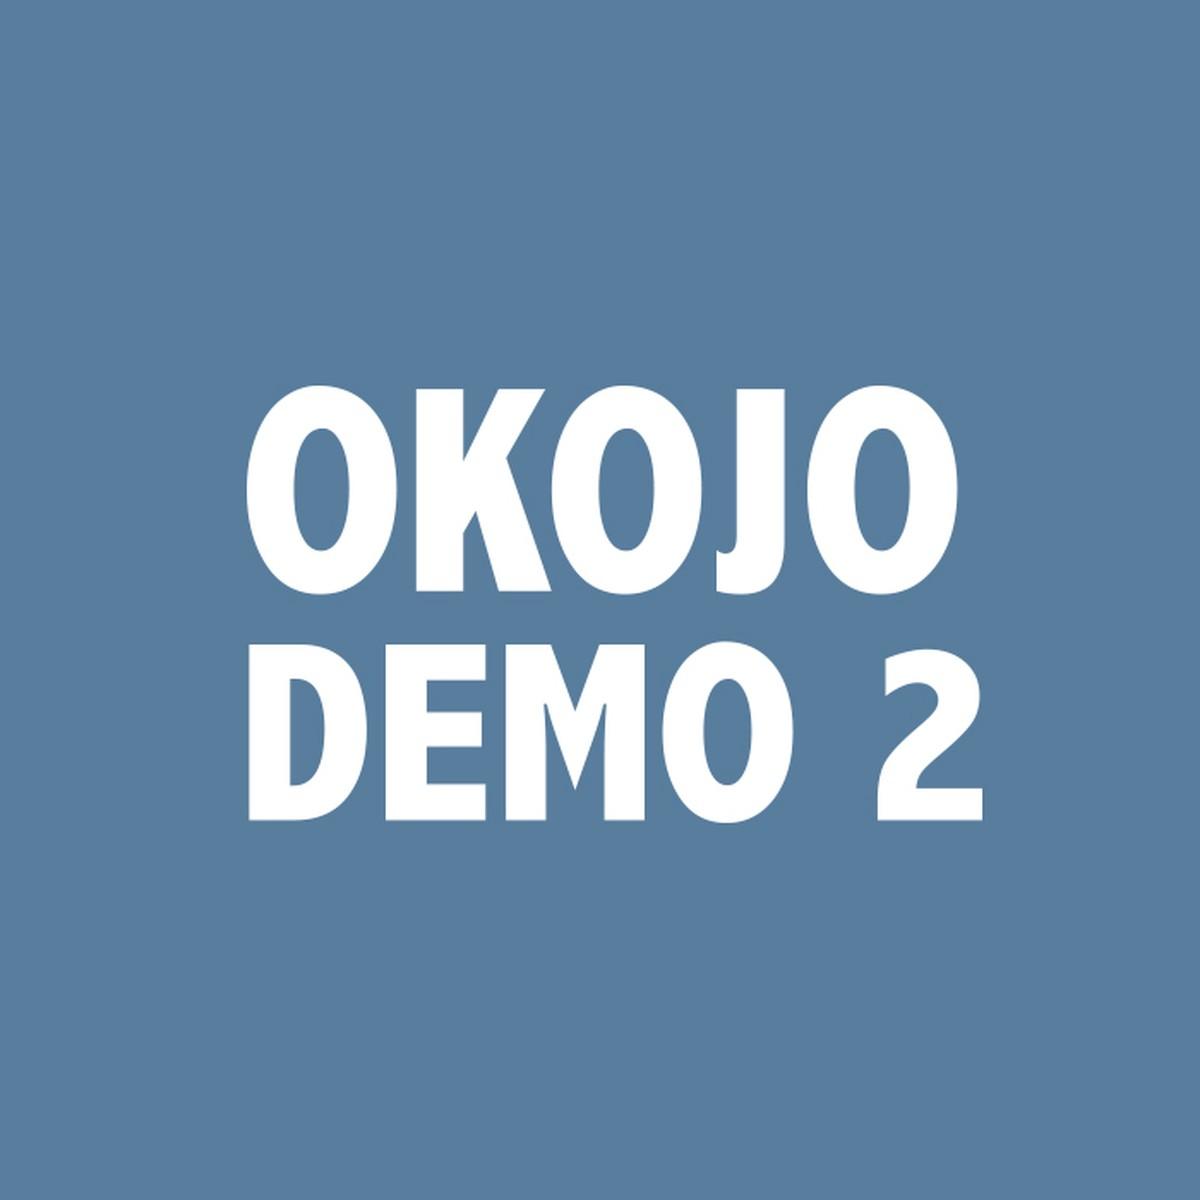 『OKOJO サイチェン・マイフォーチュン 歌詞』収録の『DEMO 2』ジャケット